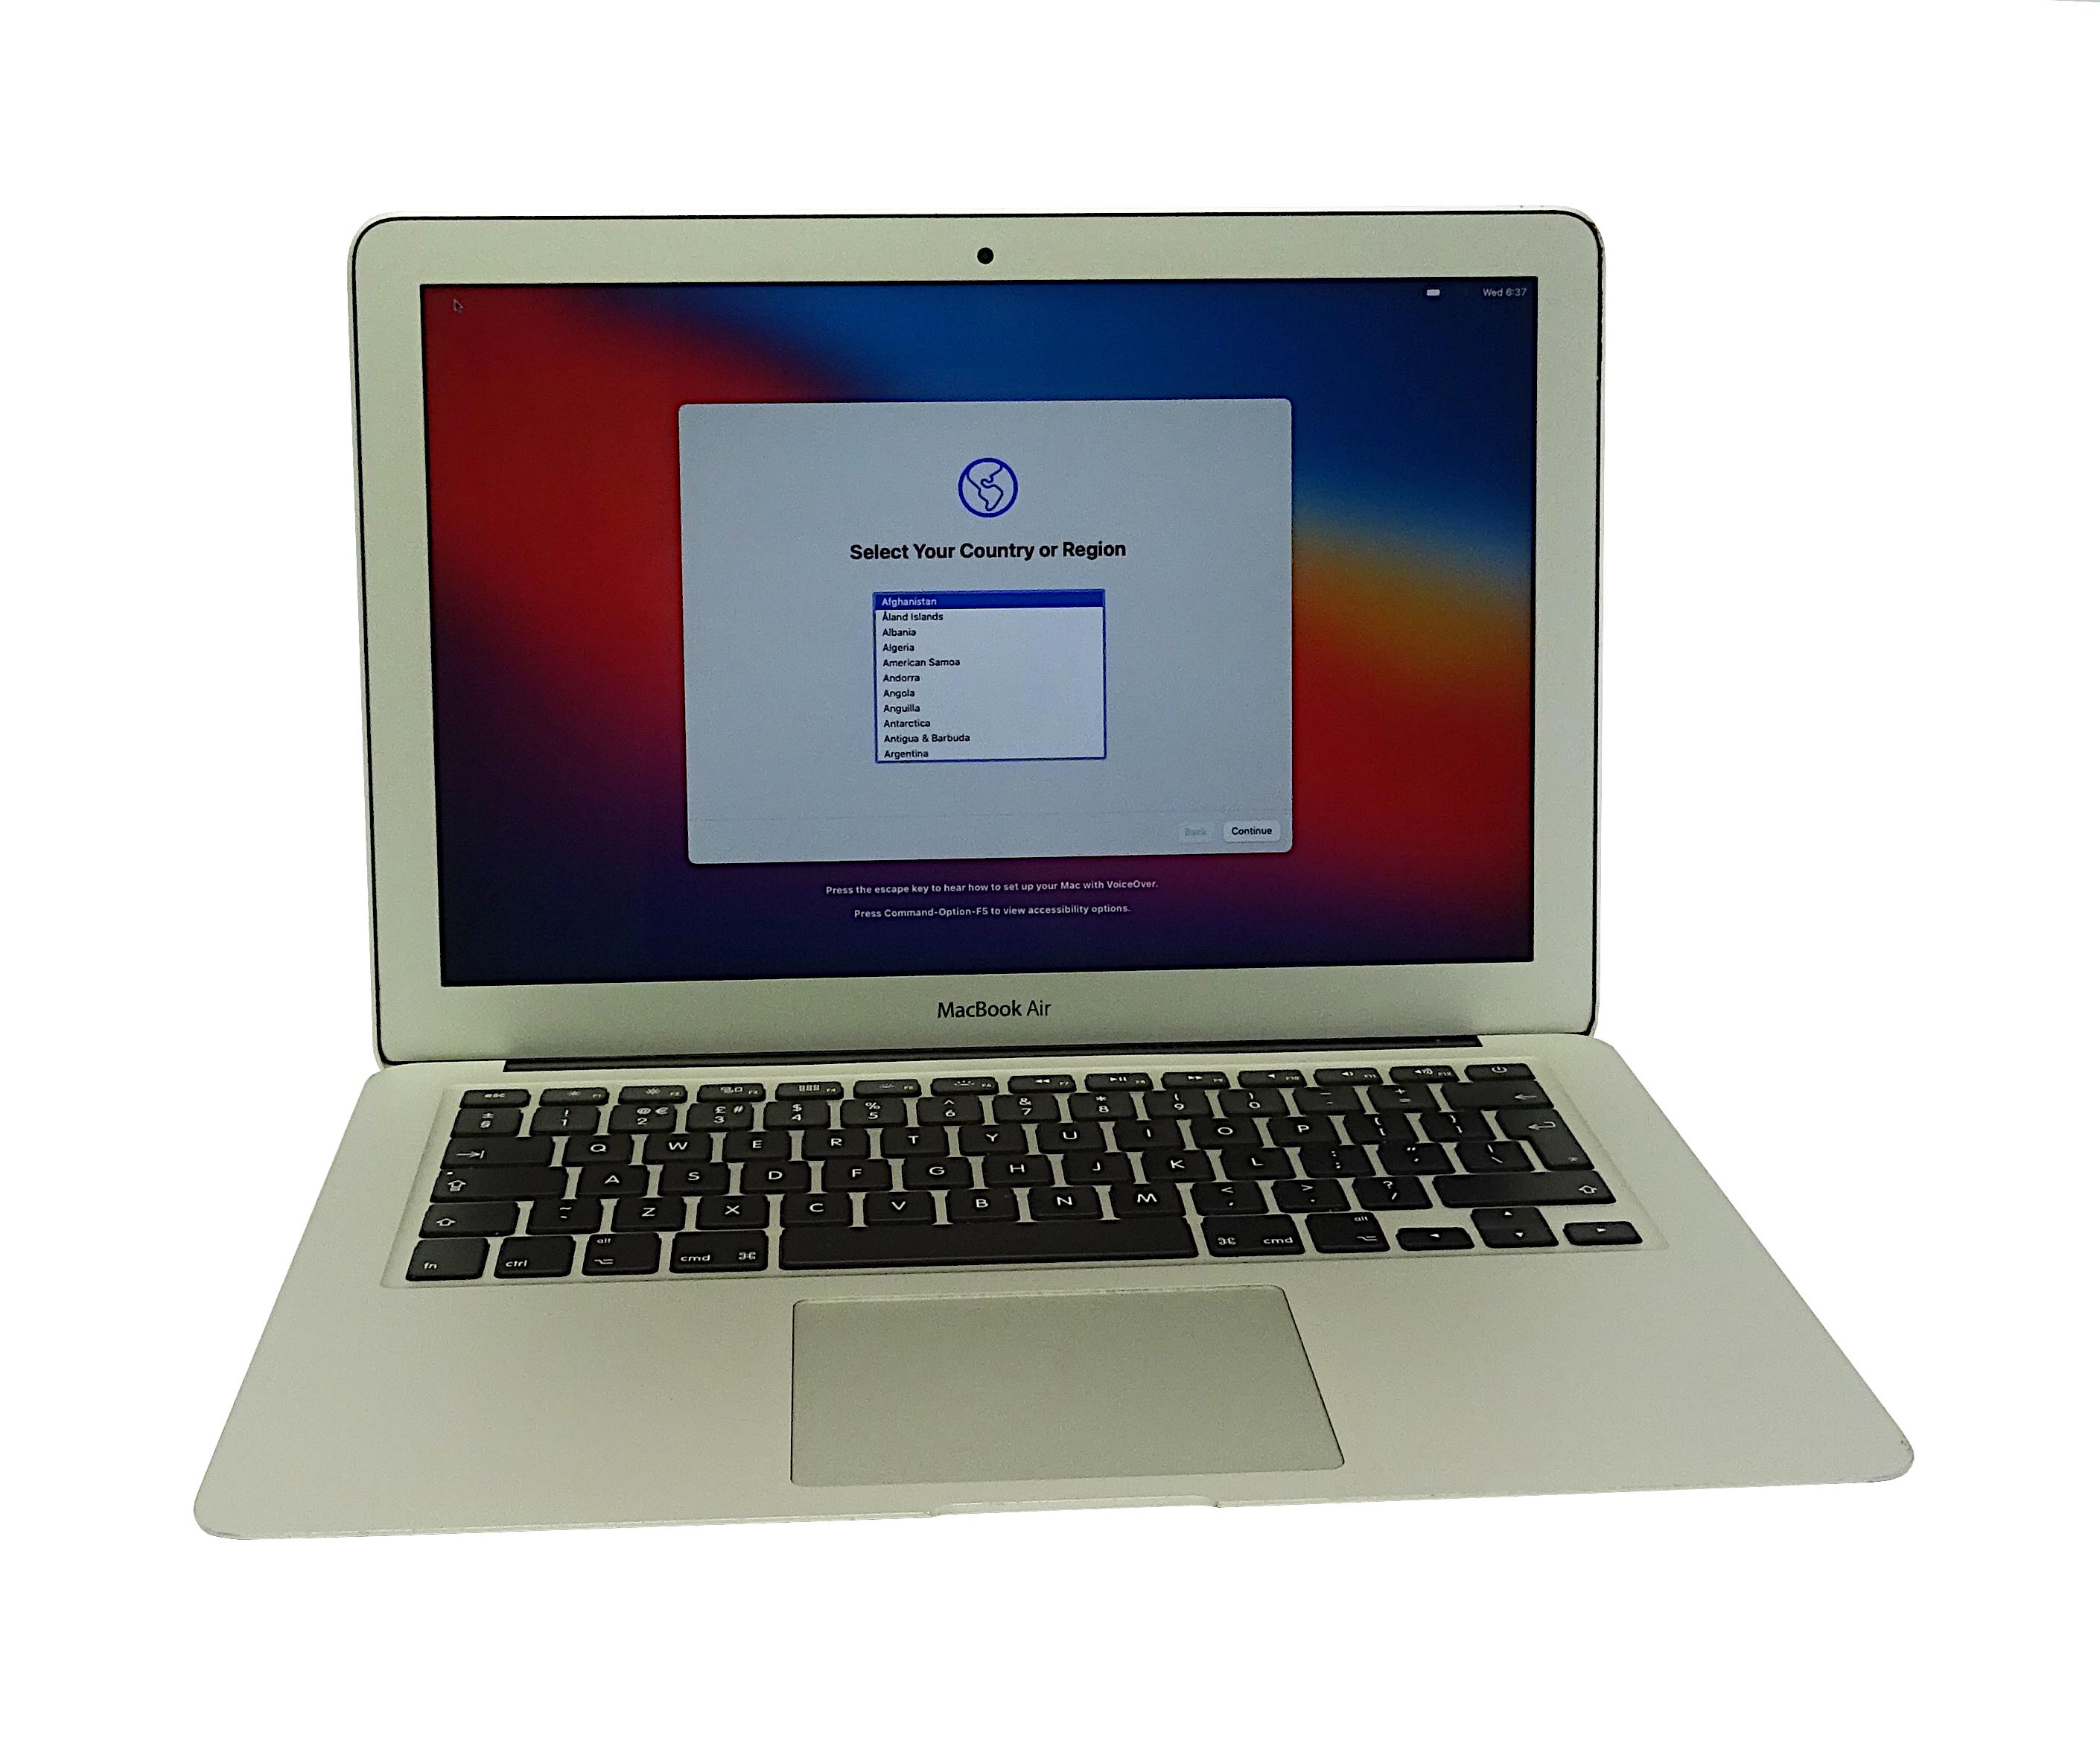 "Apple MacBook Air 13"" A1466 Early 2015 Core i5 1.6GHz 4GB 128GB SN:C02P88RLG940"